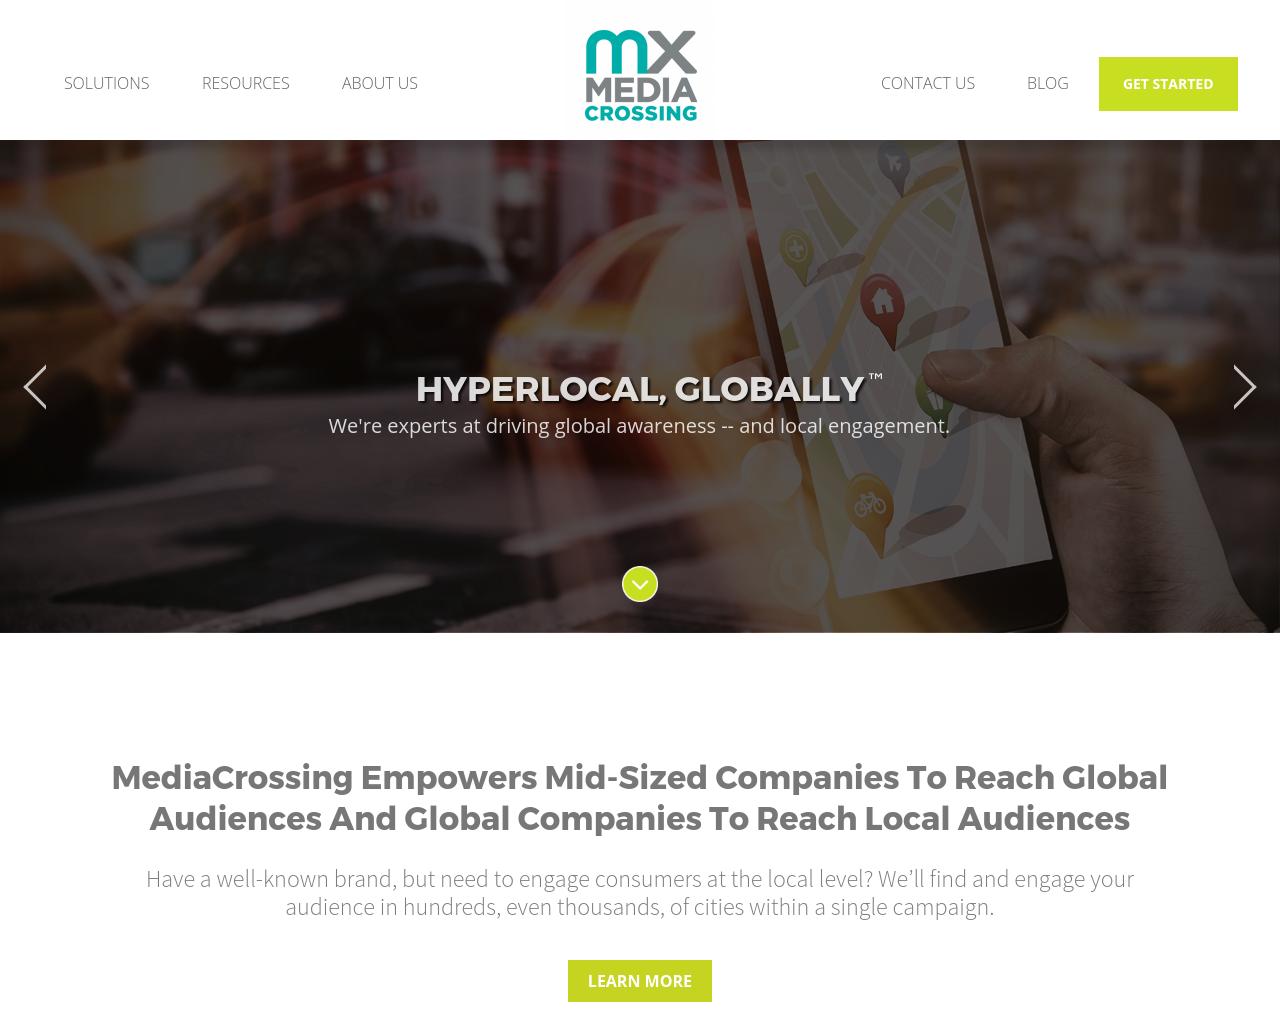 MediaCrossing-Advertising-Reviews-Pricing